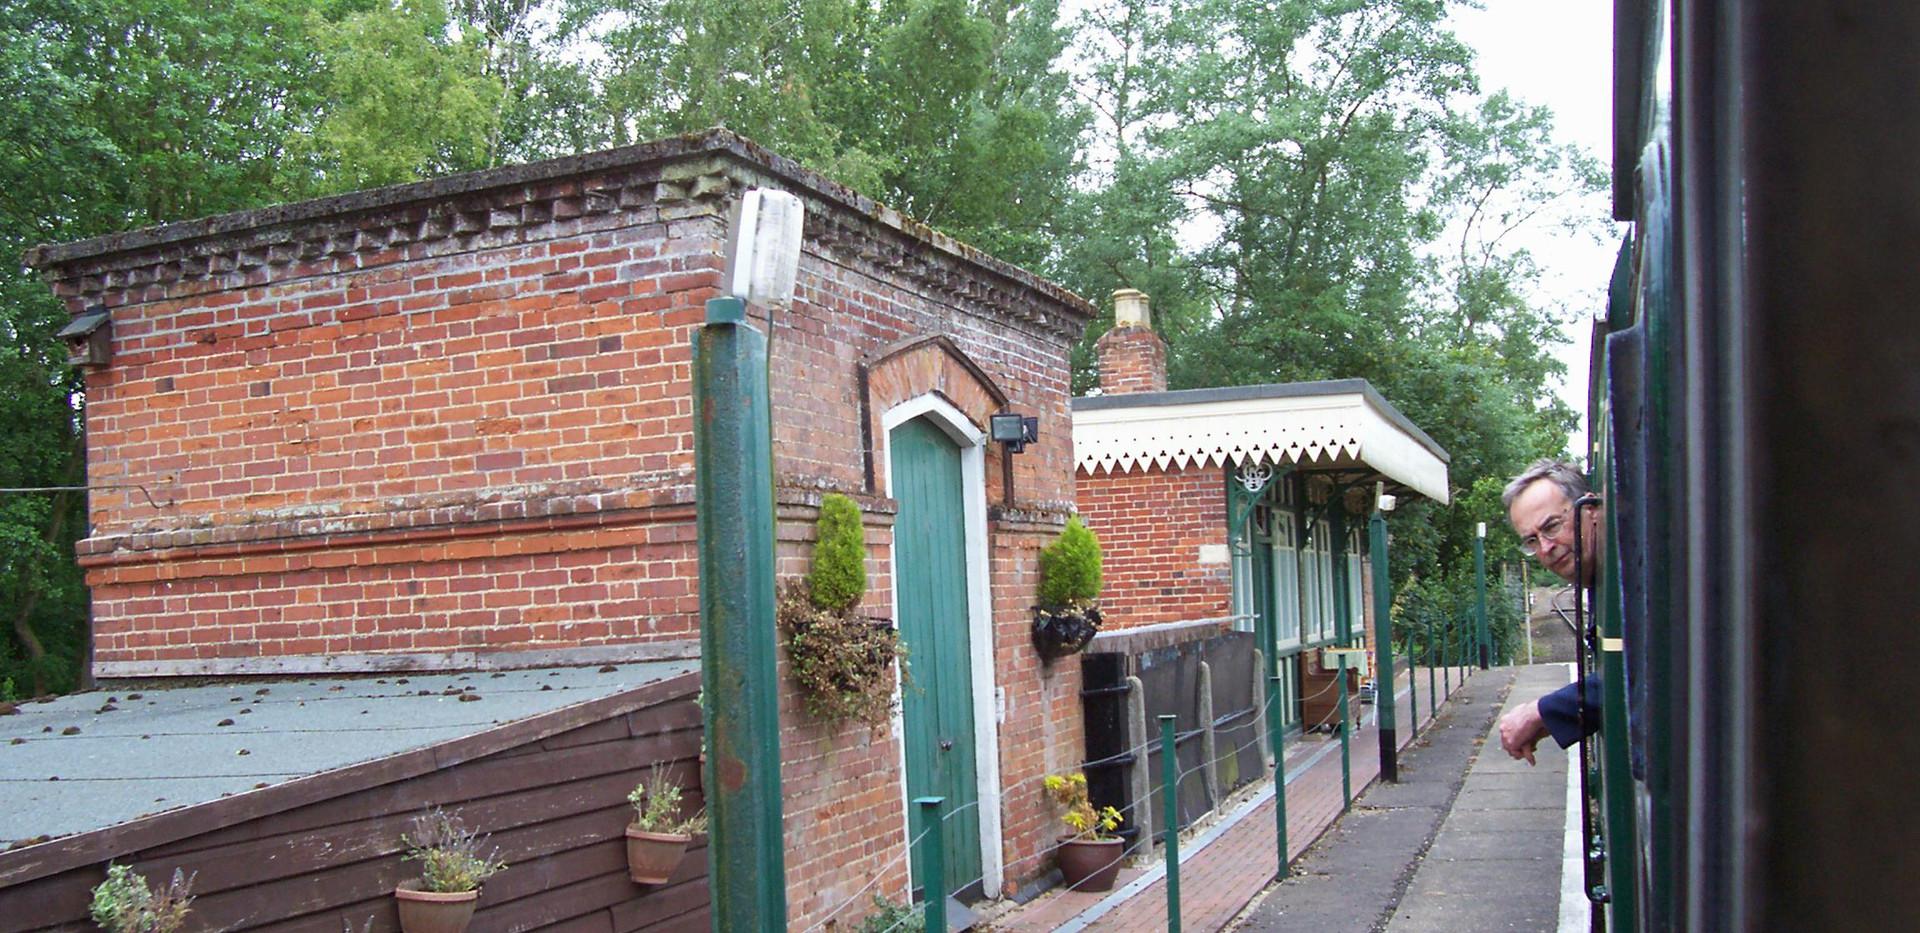 Thuxton Station